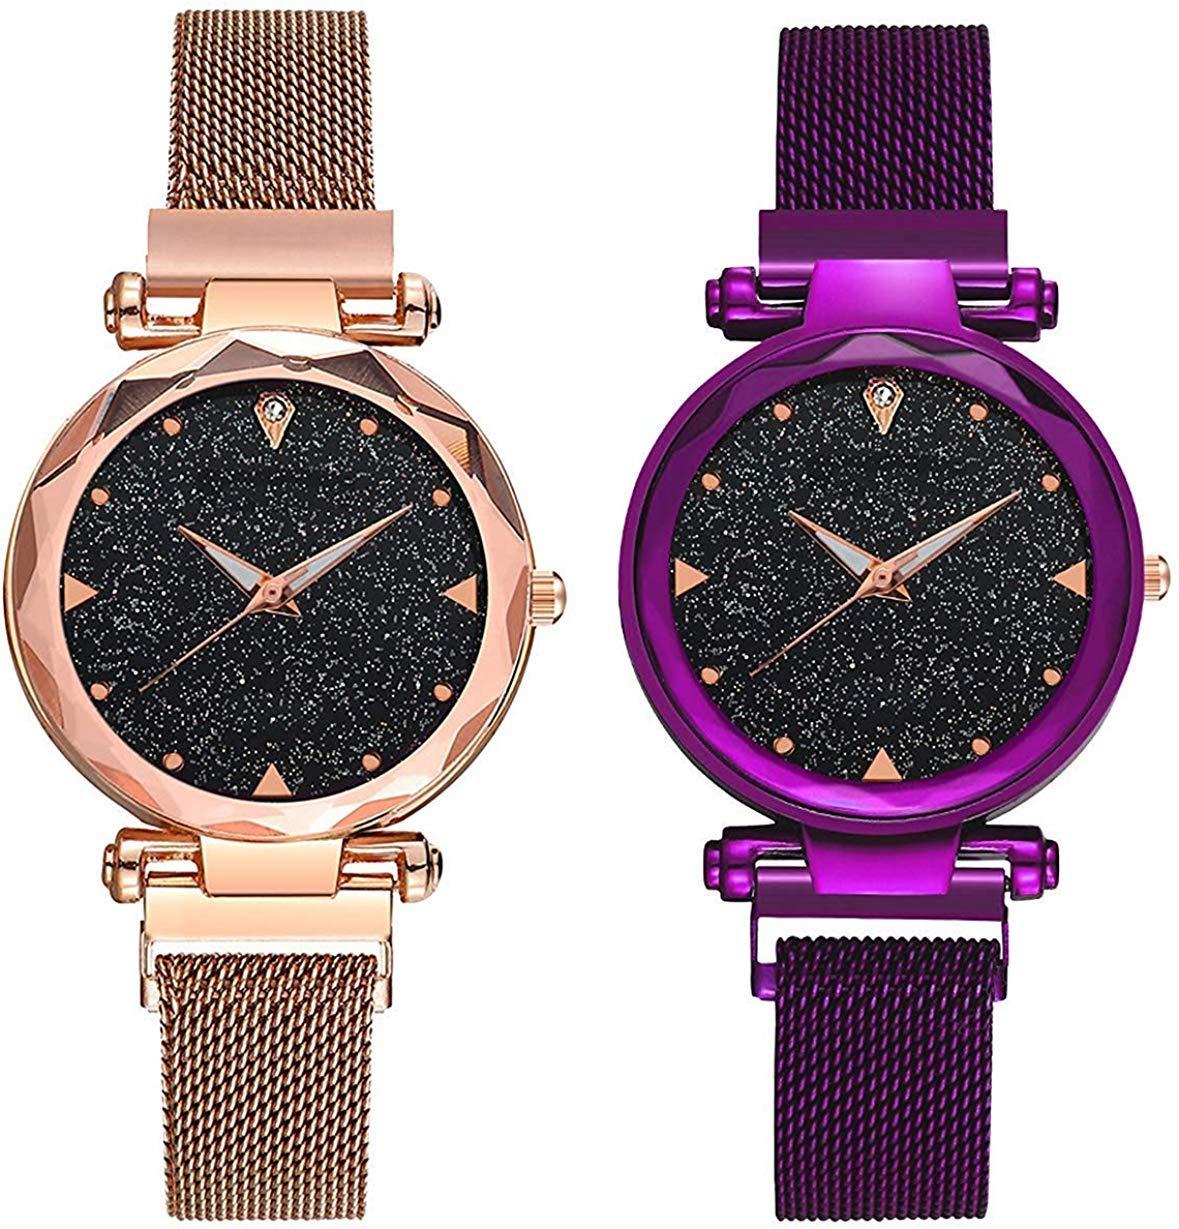 KDENTERPRISE Casual Designer Black Dial Combo of Magnet Watch - Pair of 2 - for Girls & Women - Purple-Copper (B083475CLZ) Amazon Price History, Amazon Price Tracker